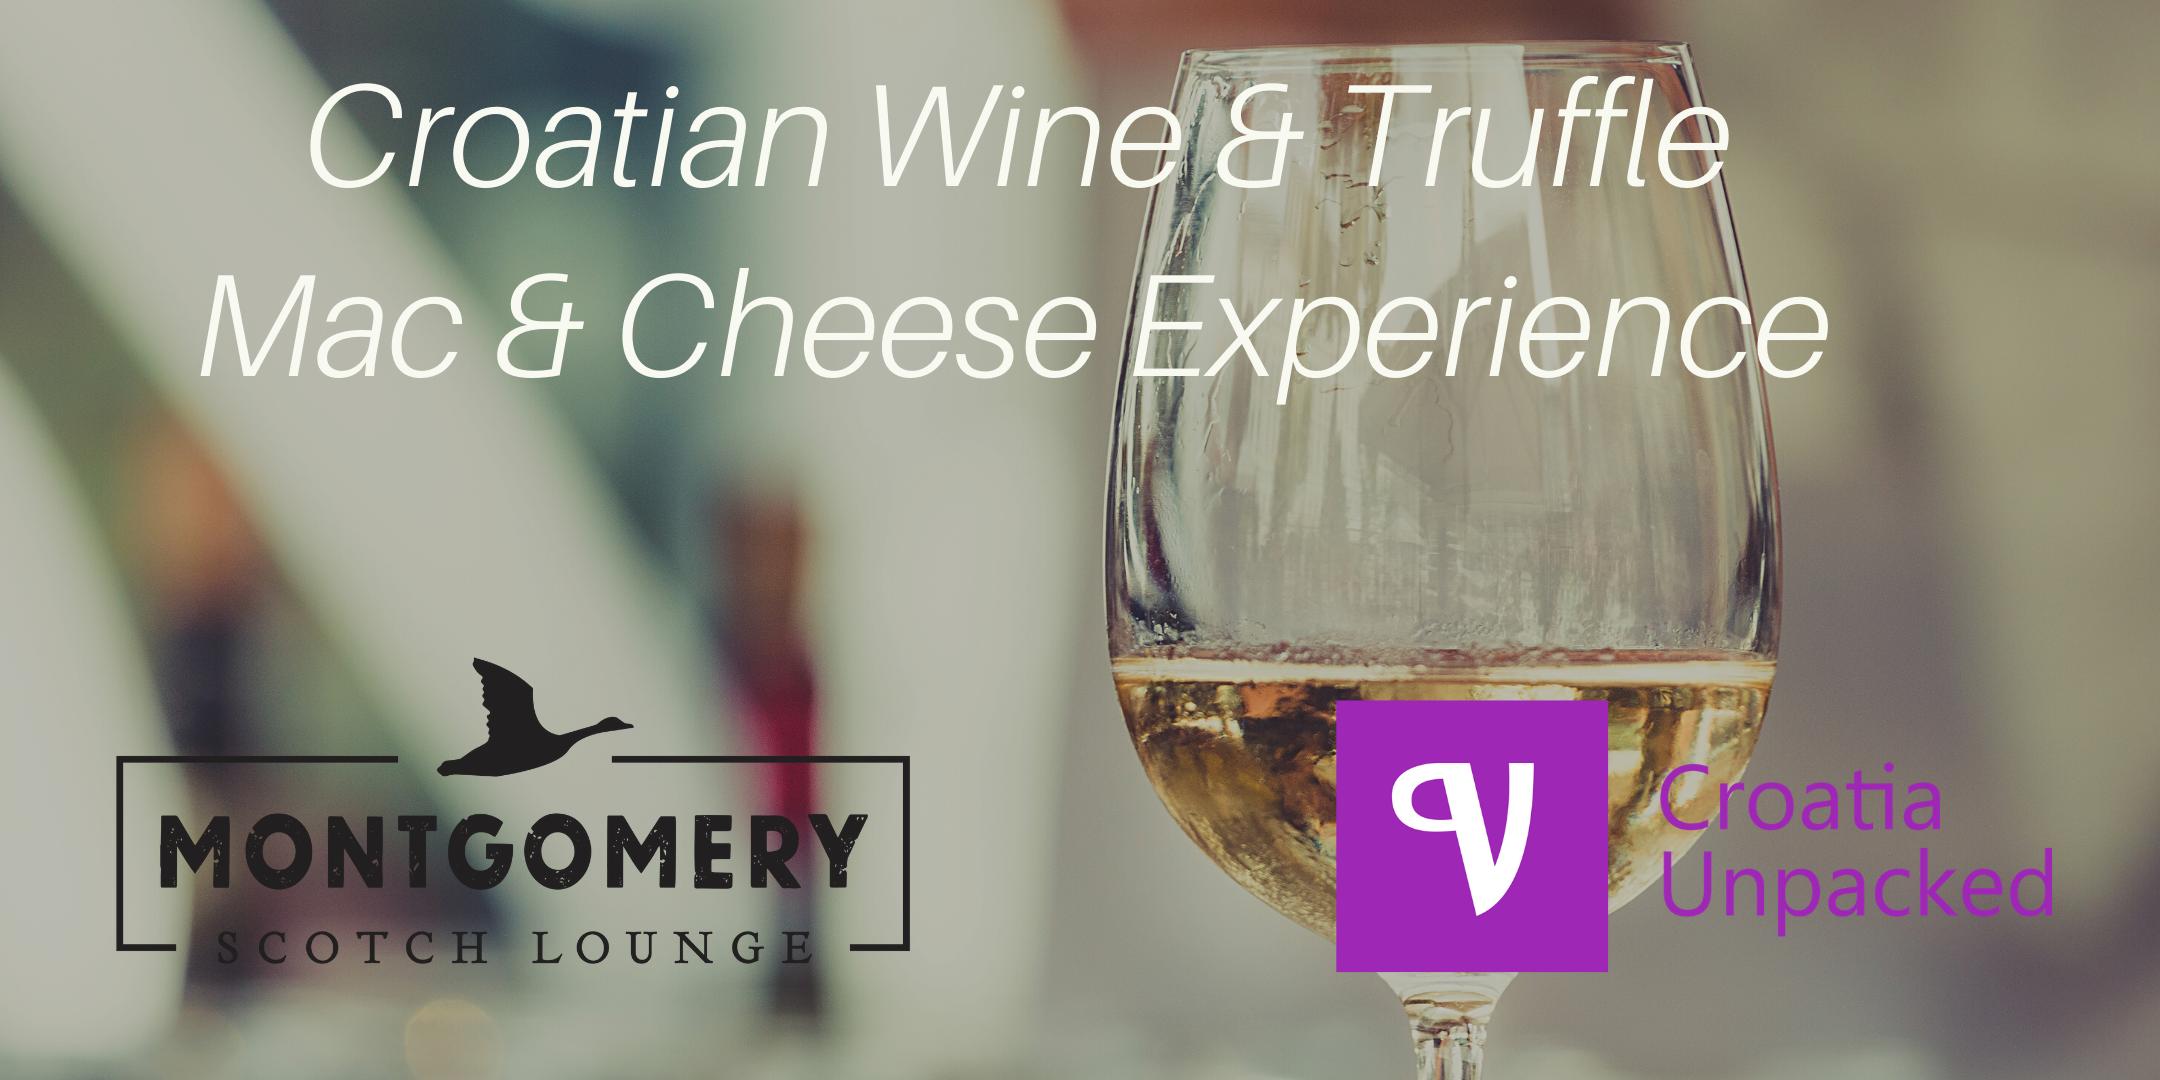 Croatia Uncorked - Croatian Wine Event with Truffle Mac & Cheese